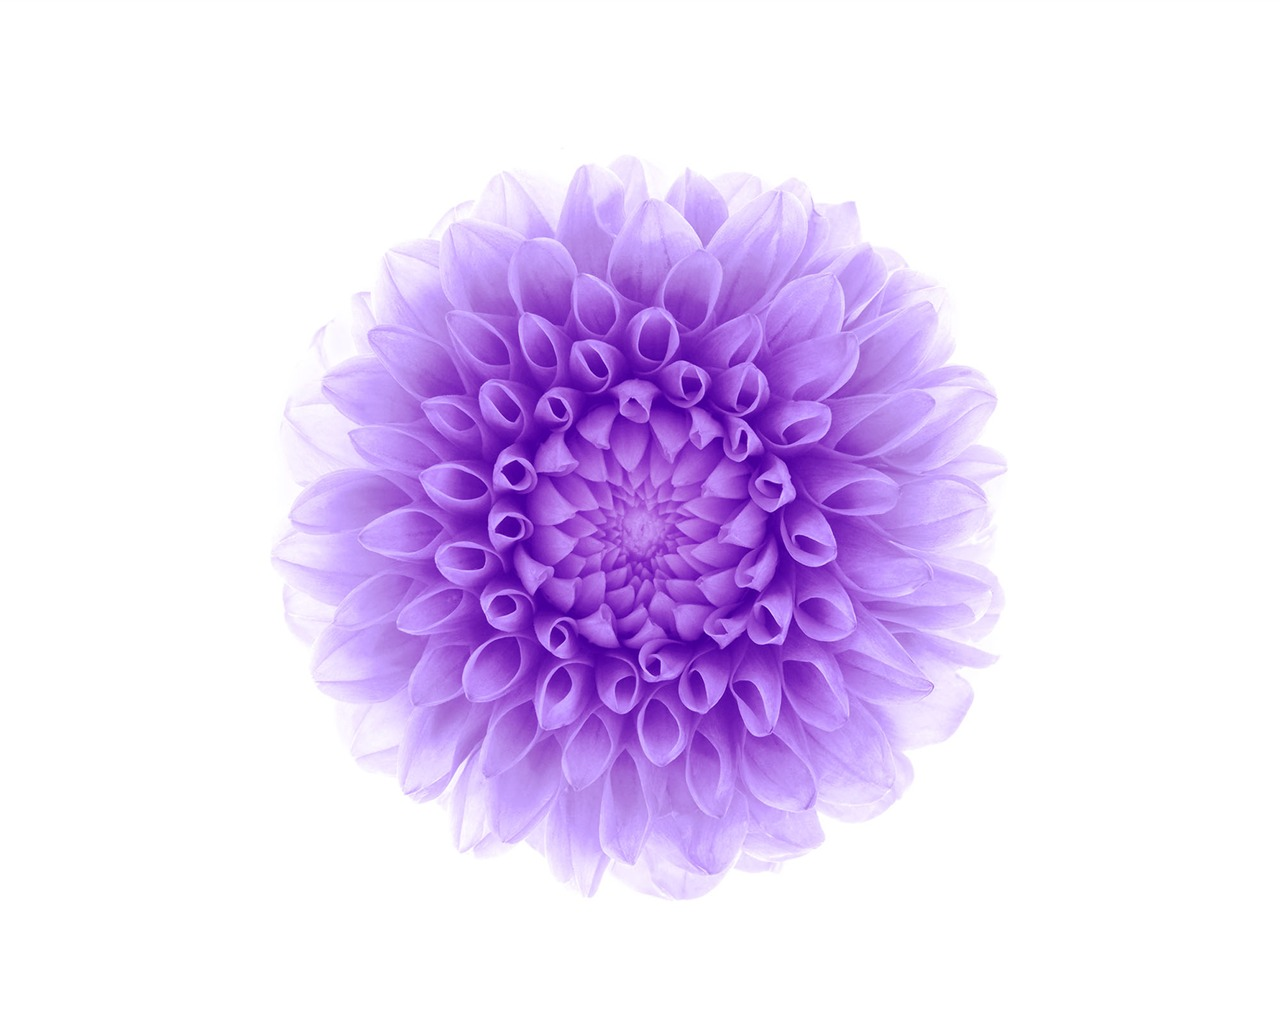 Purple Iphone 6 Wallpaper 14276 Wallpaper: Flor Roxa-Apple IOS8 IPhone6 Plus Wallpaper HD